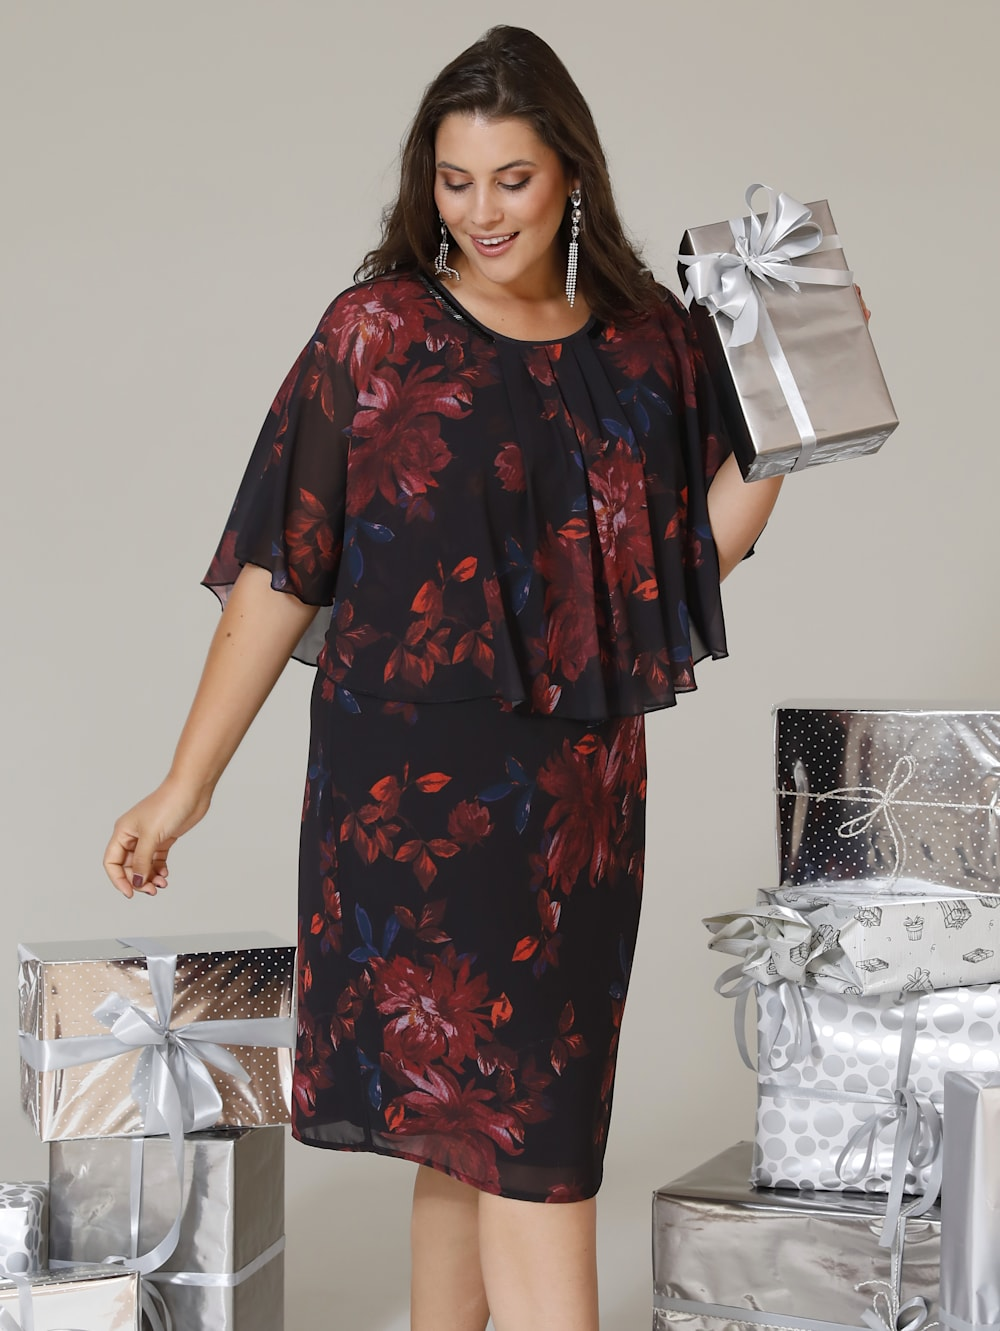 miamoda kleid mit elegantem blumendruck | klingel